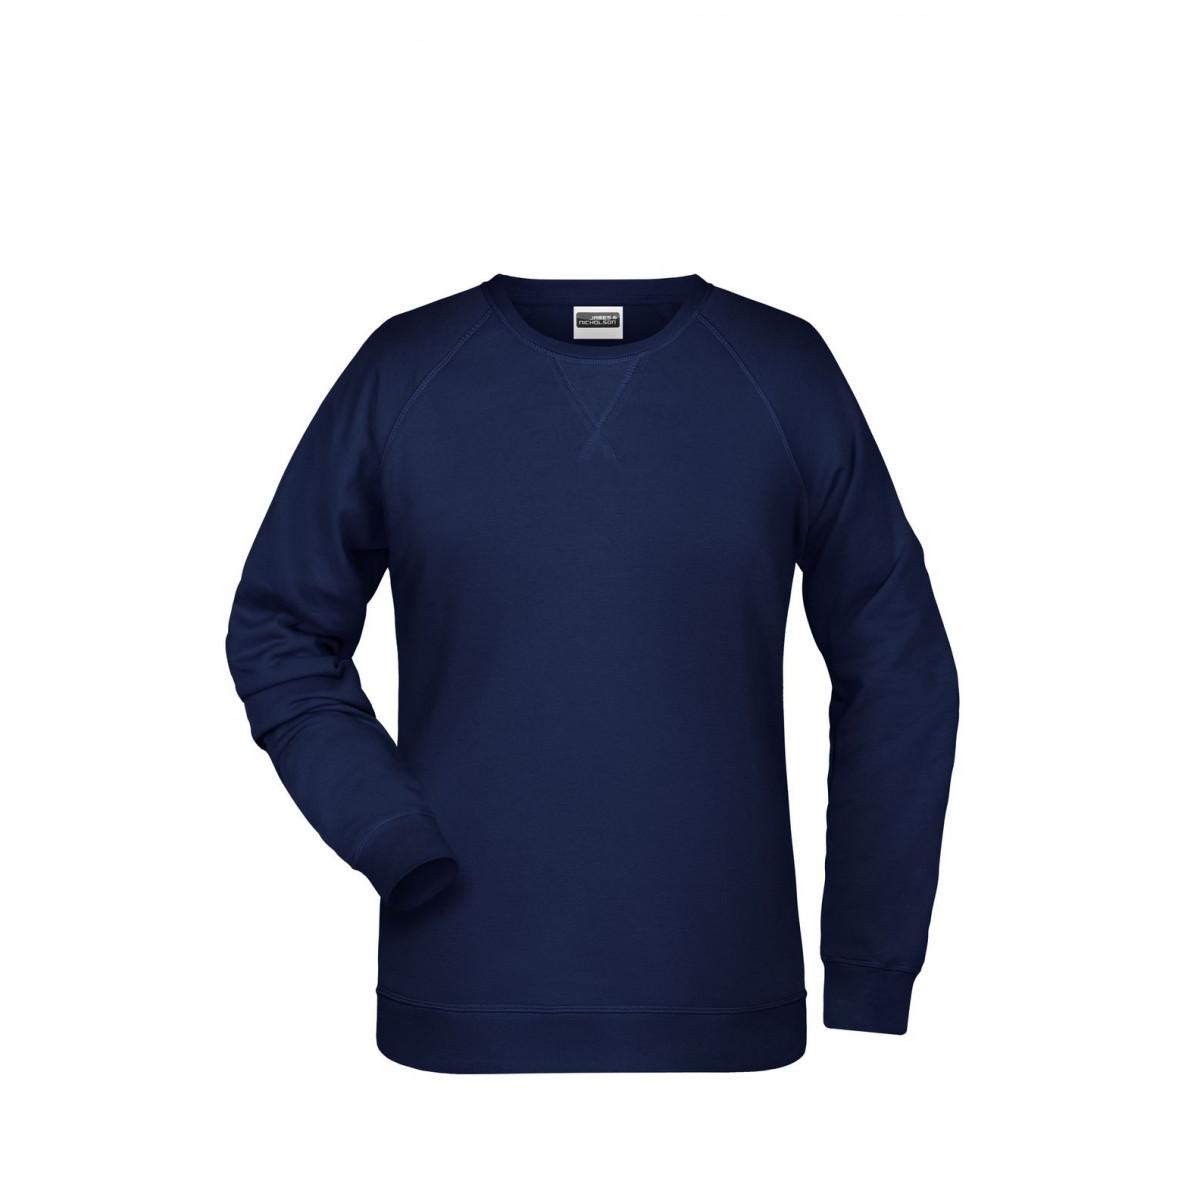 Толстовка женская 8021 Ladies Sweat - Темно-синий